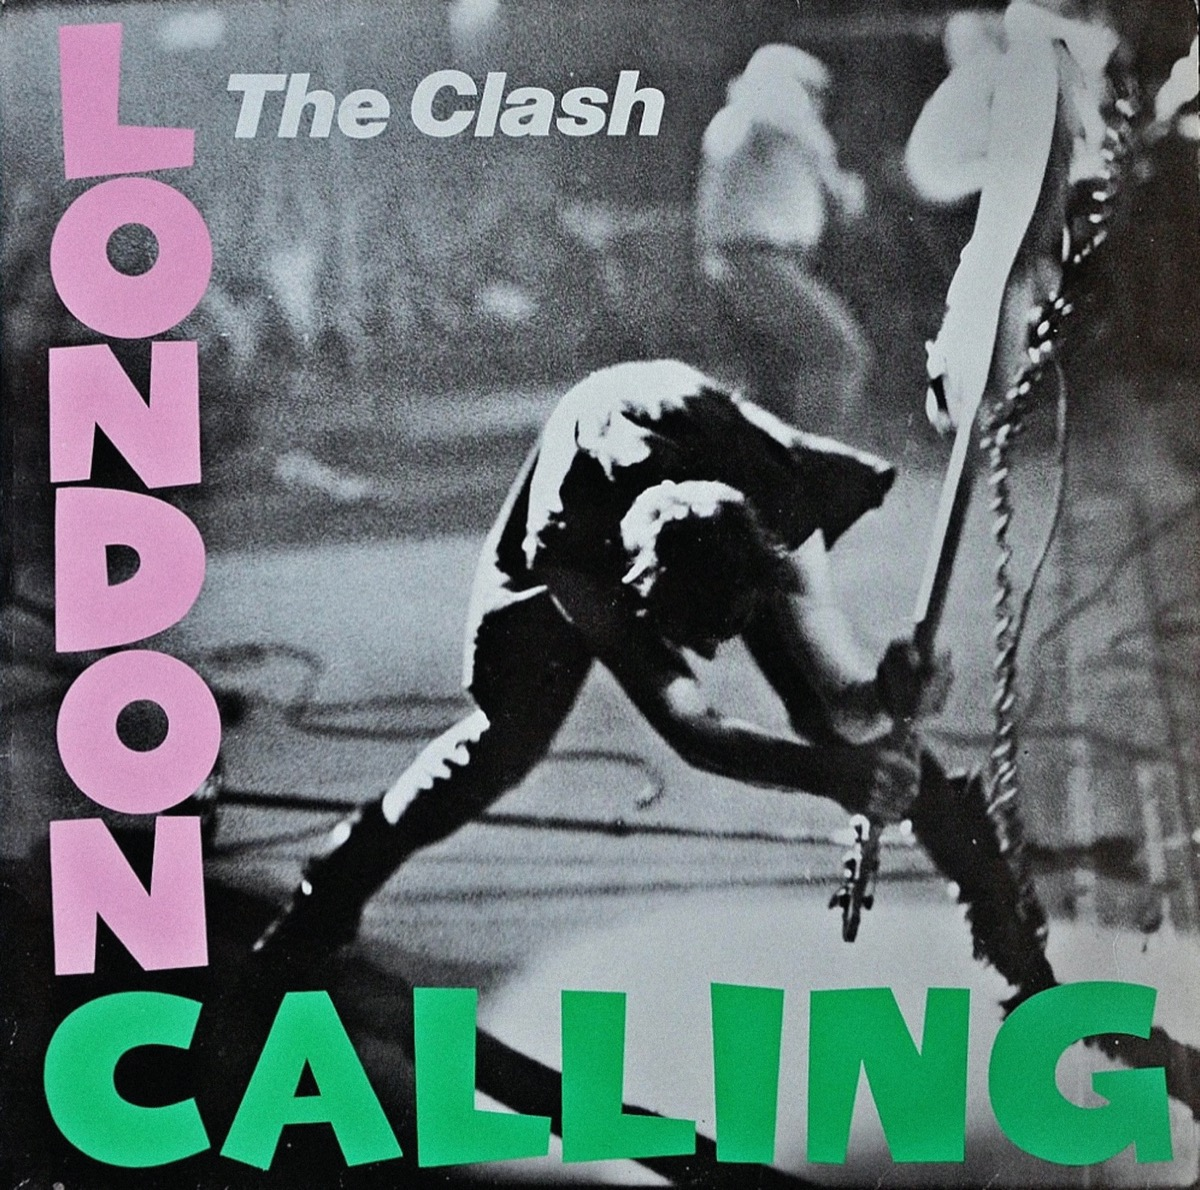 London Calling - Vintage vinyl album cover